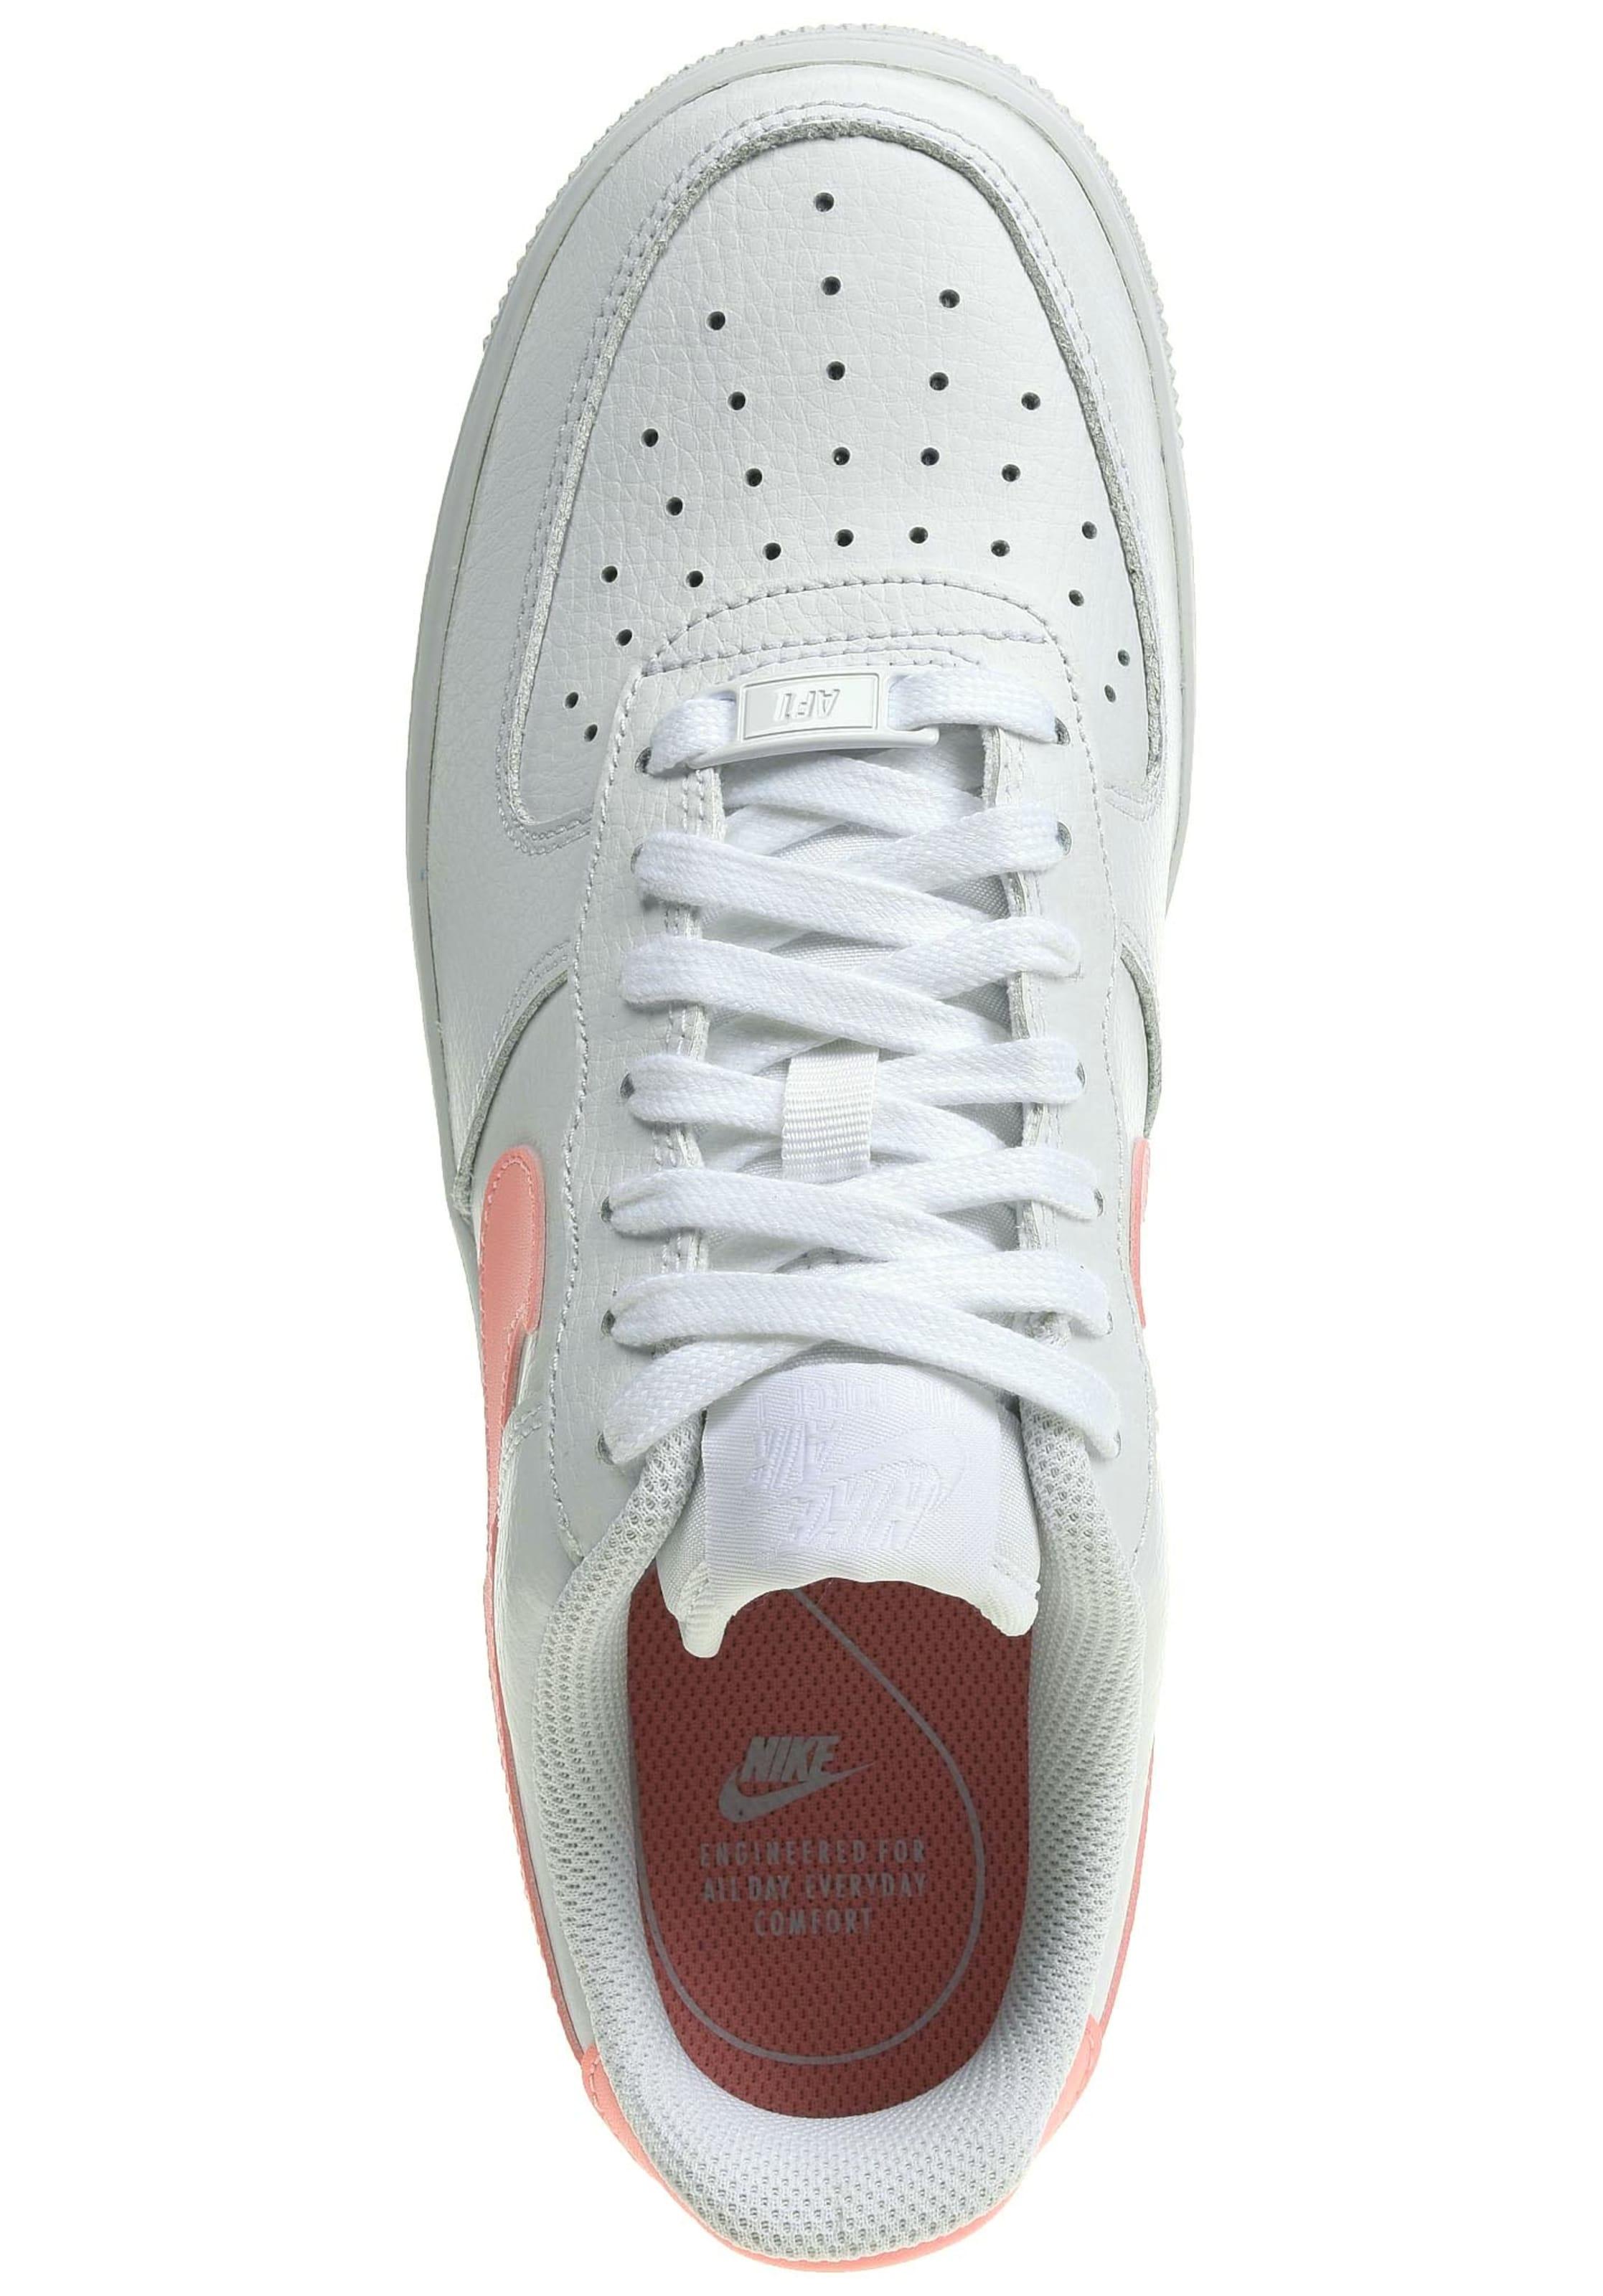 Nike Sportswear Turnschuhe 'Air Force 1 07 07 07 Leder Billige Herren- und Damenschuhe 70d346